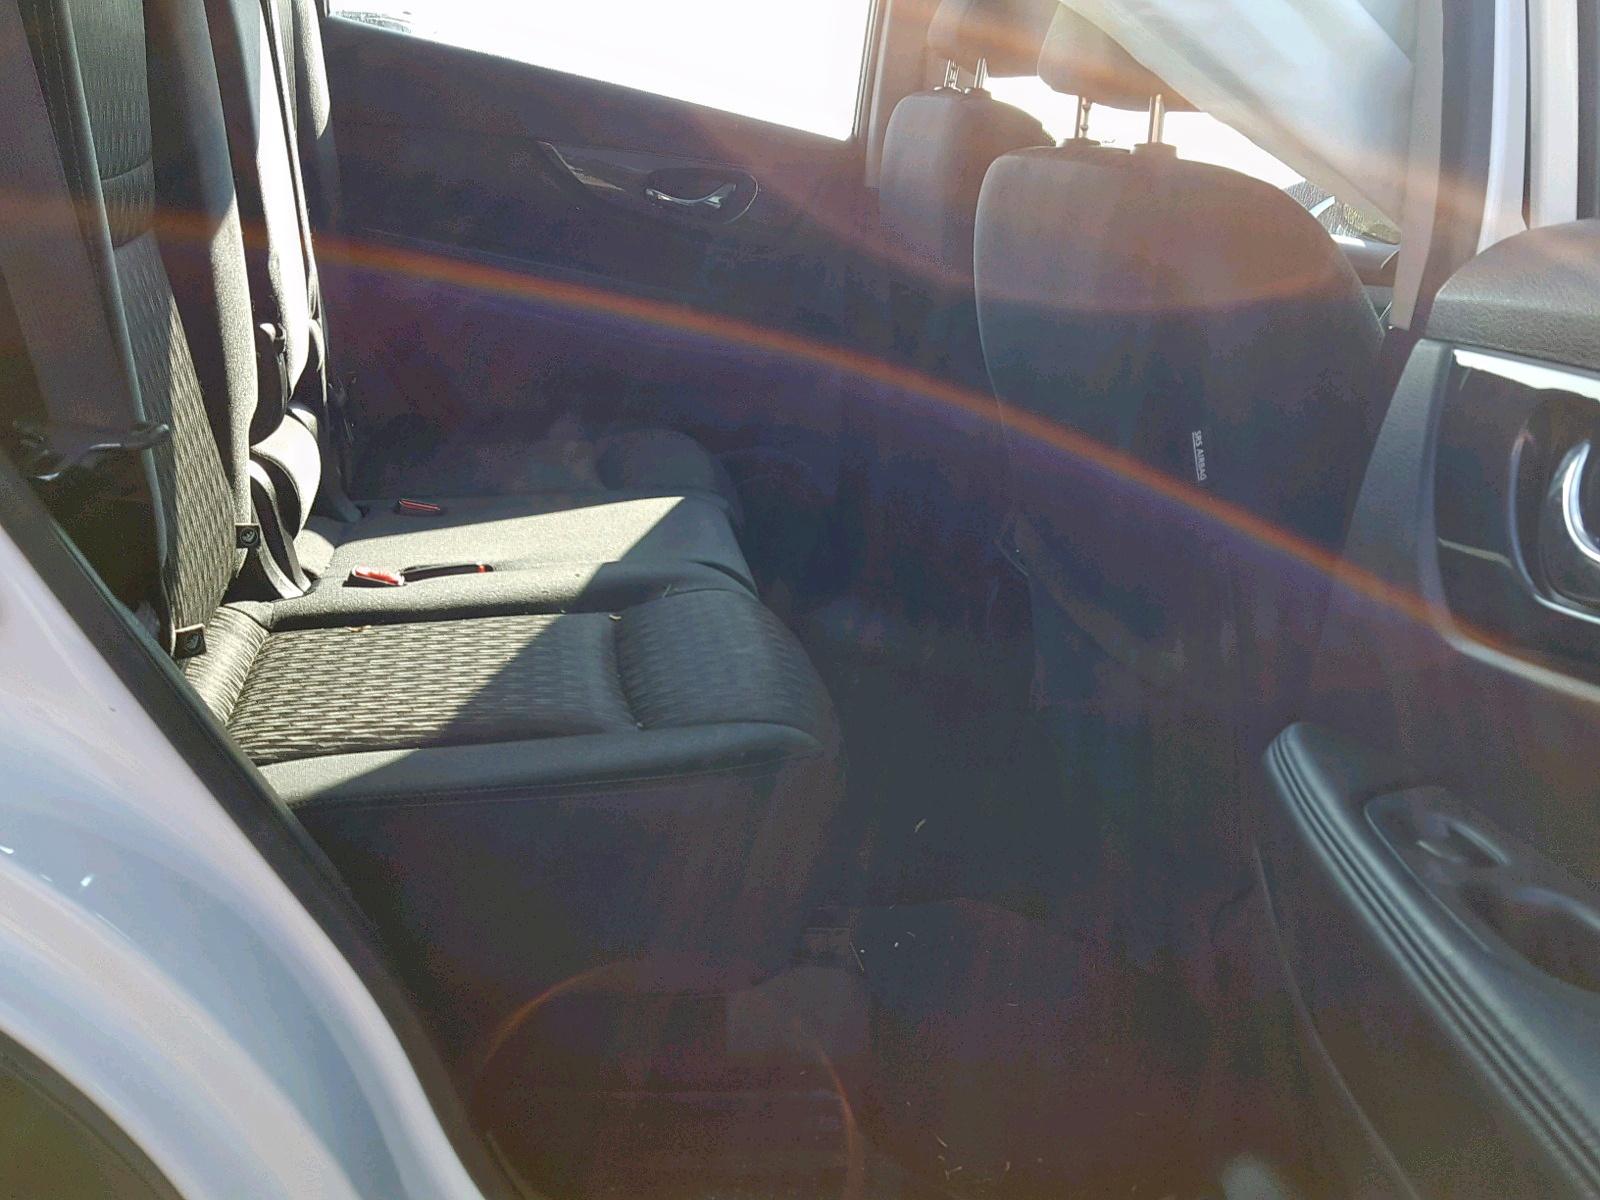 2017 Nissan Rogue S 2 5L 4 in NC - Mocksville